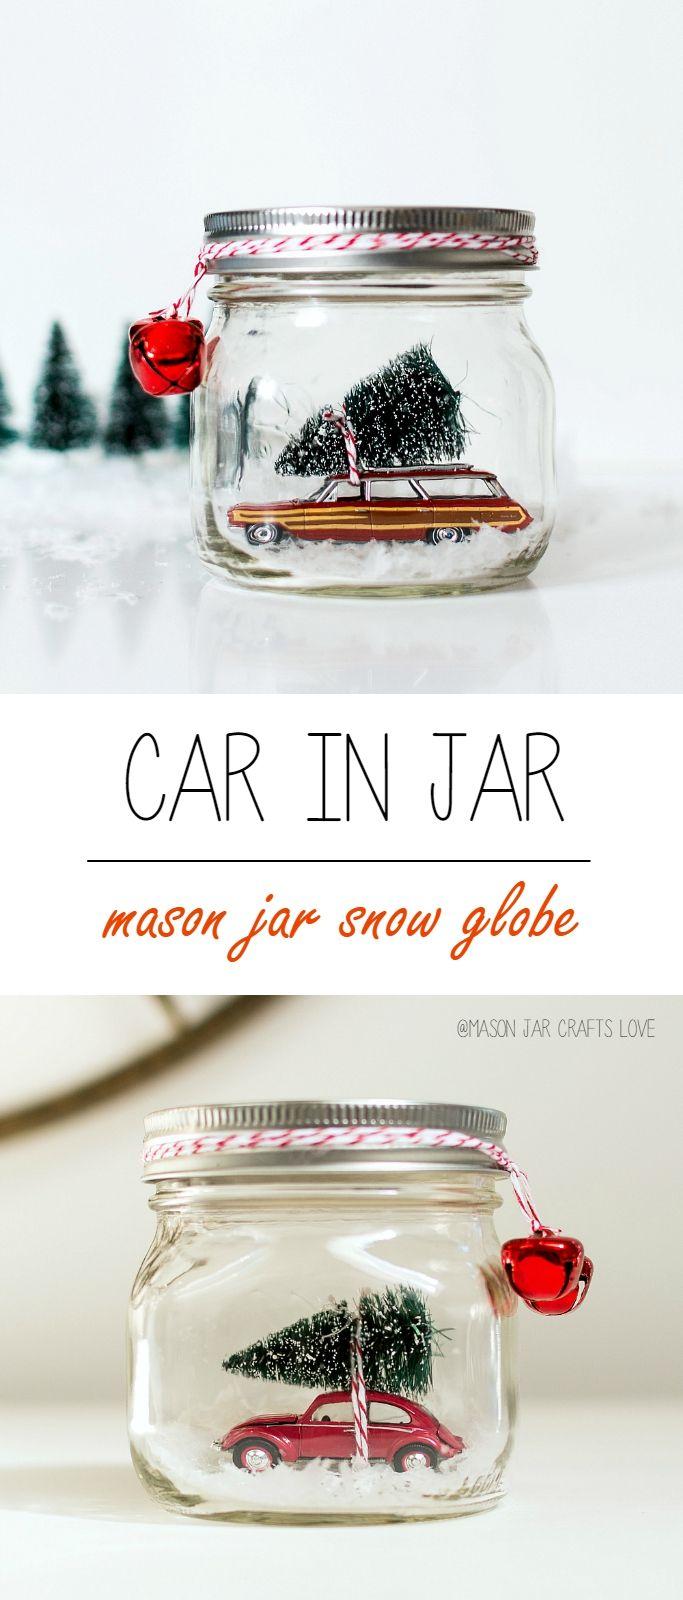 Car in Jar Snow Globe - Mason Jar Snow Globe - Station Wagon snow globe - VW Beetle 1/64 with bottle brush tree in mason jar snow globe